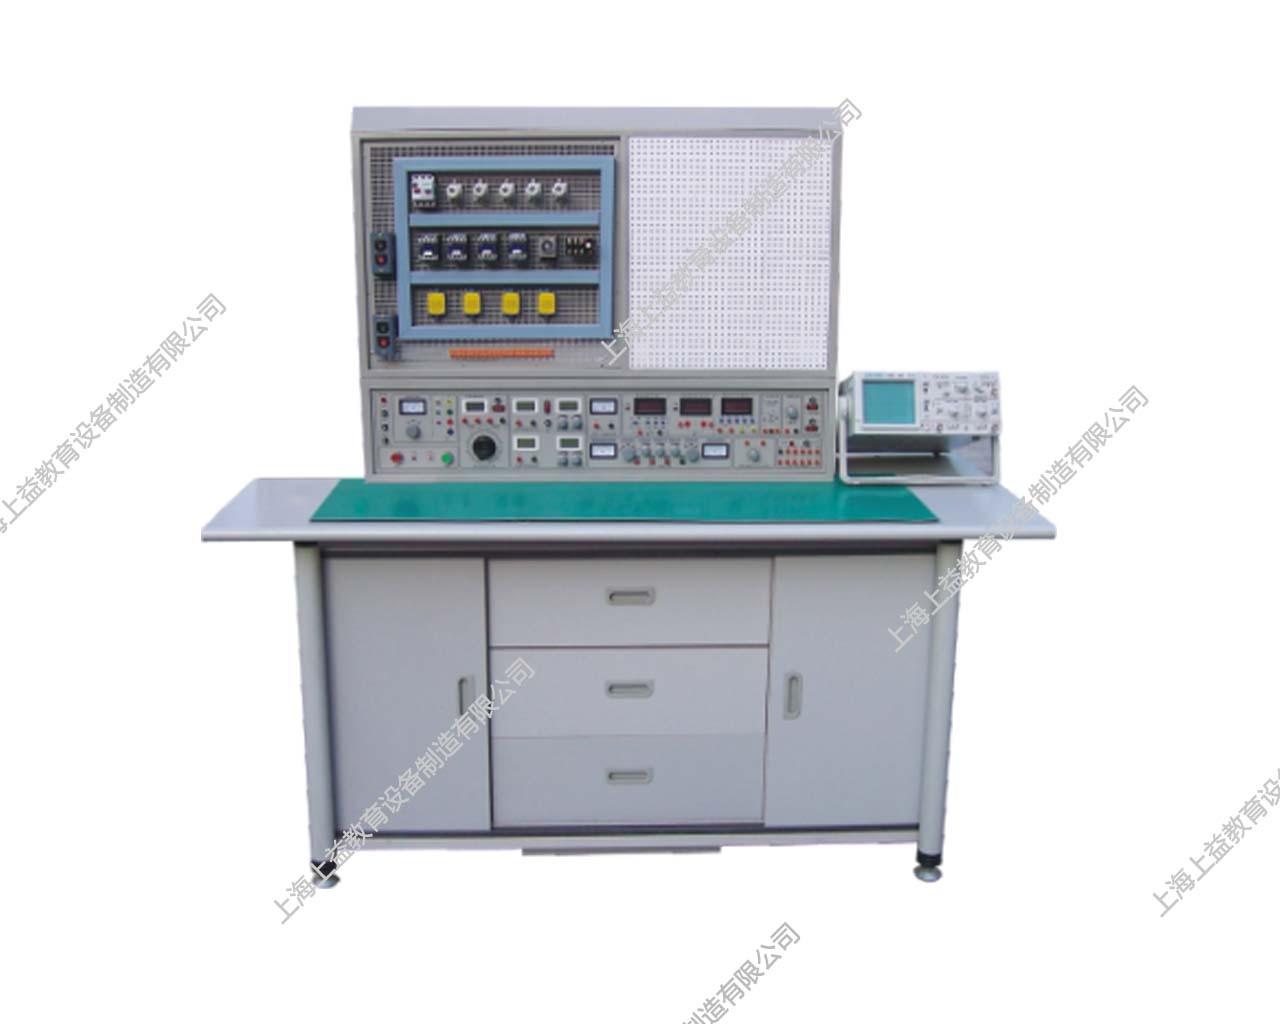 SYJNL-365D立式电工电子电拖(带直流电机)创新实验与技能综合wwwlehu8viplehu68vip装置